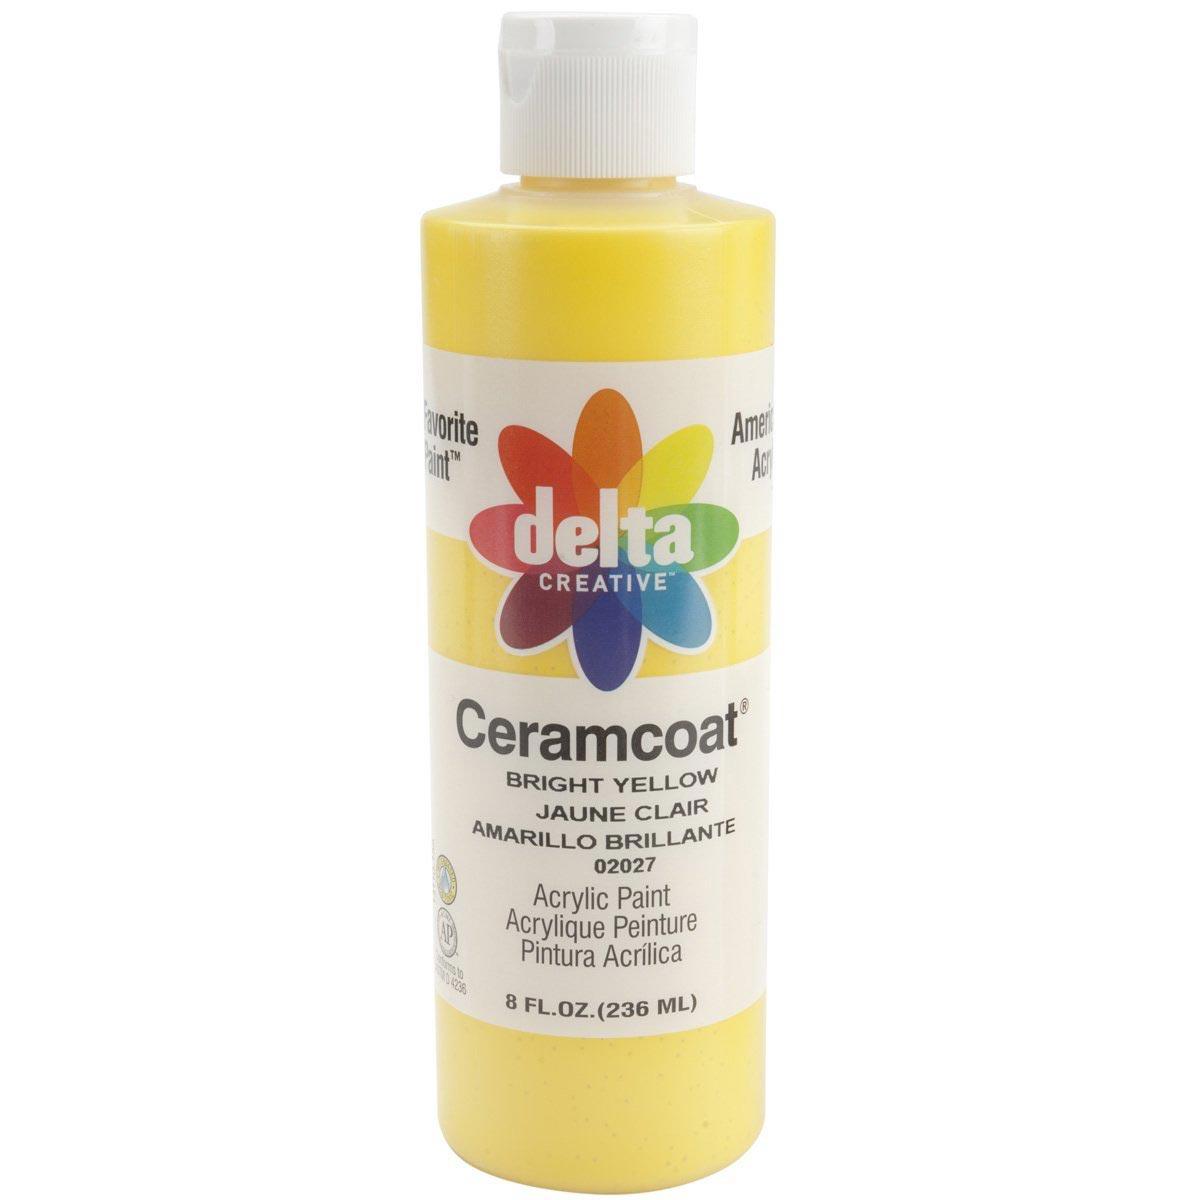 Delta Ceramcoat ® Acrylic Paint - Bright Yellow, 8 oz. - 020270802W